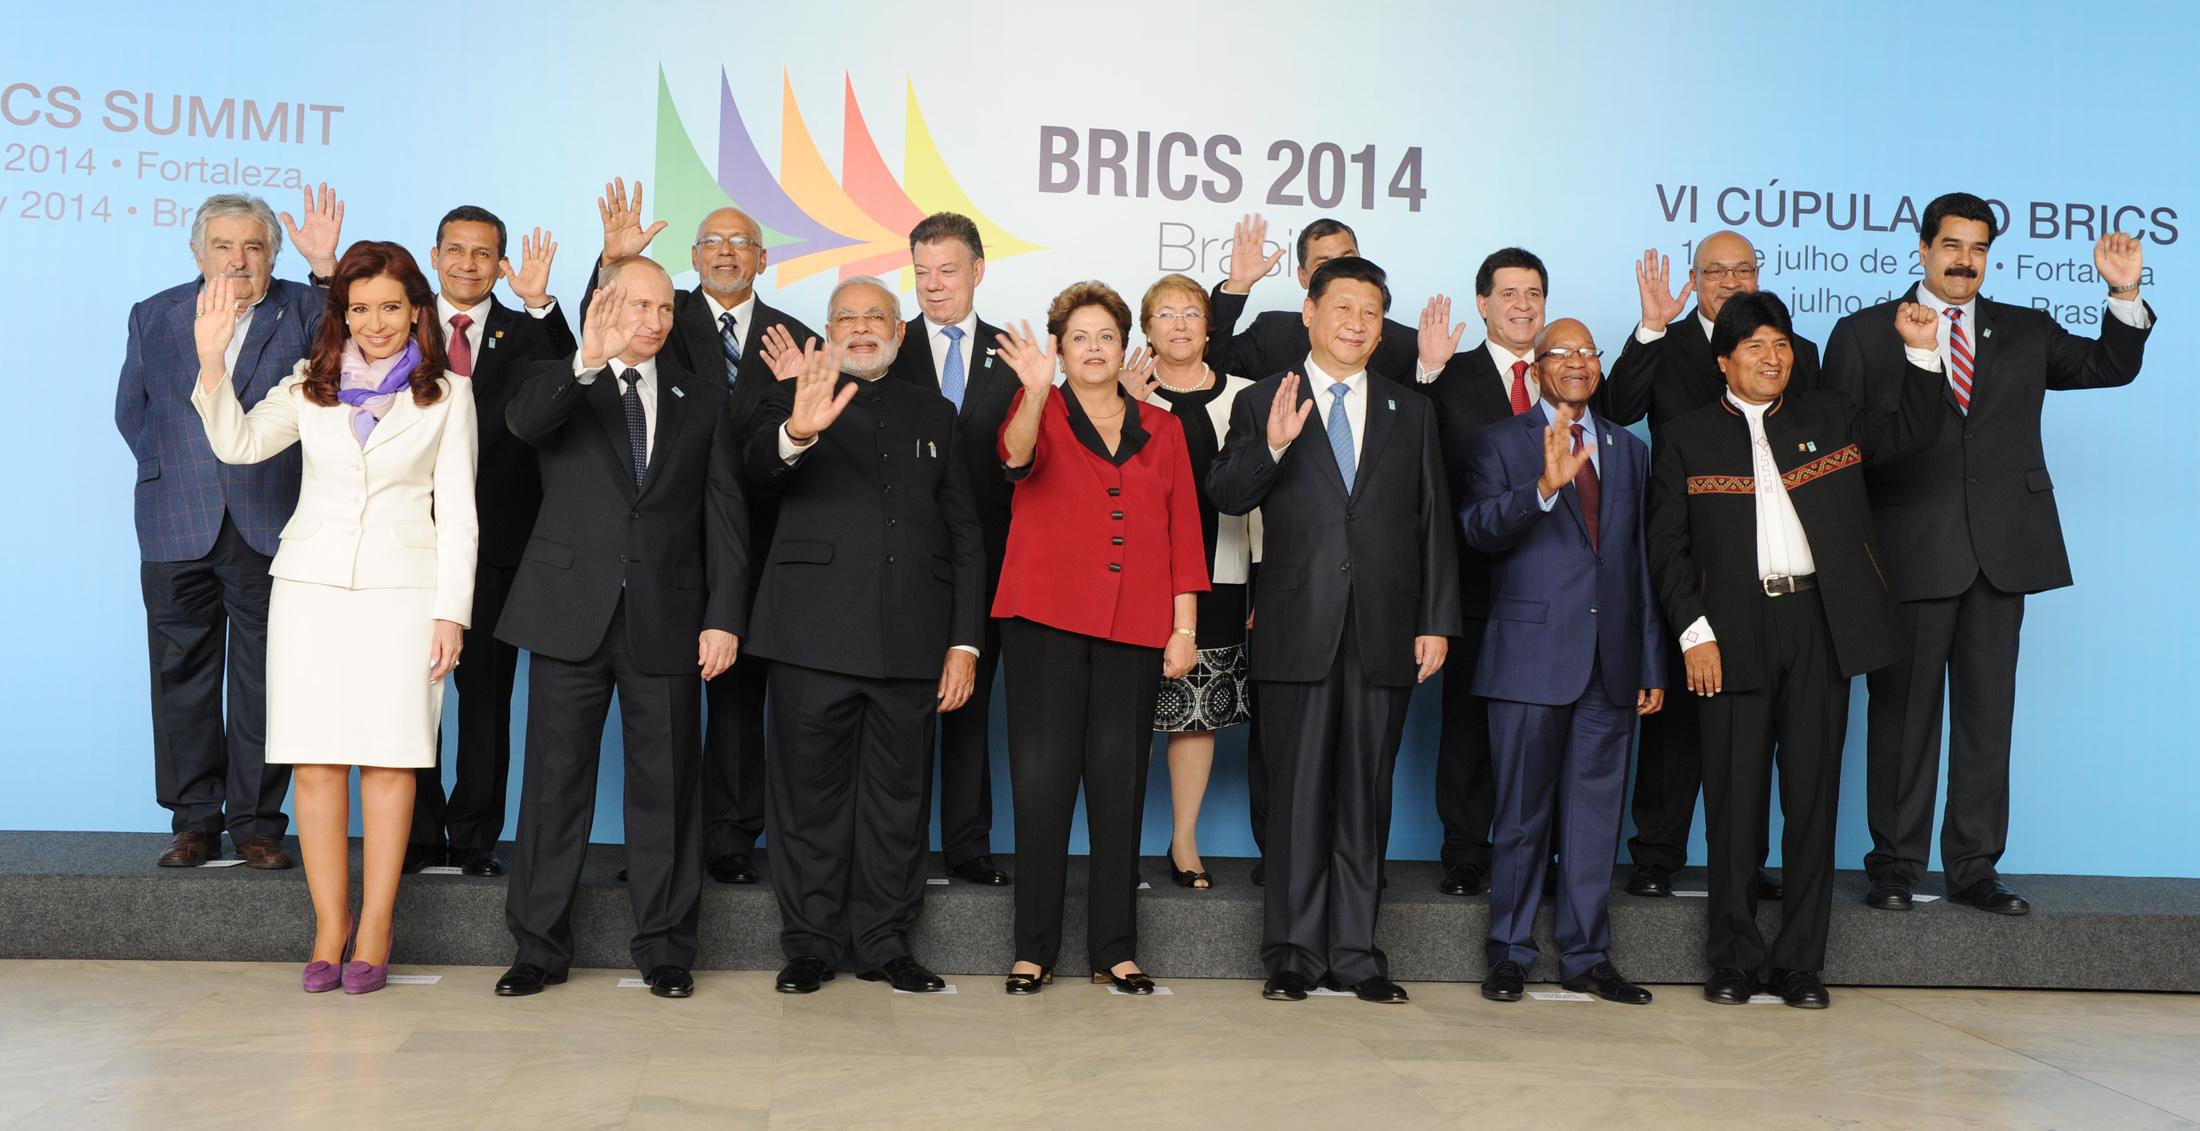 BRICS cover photo